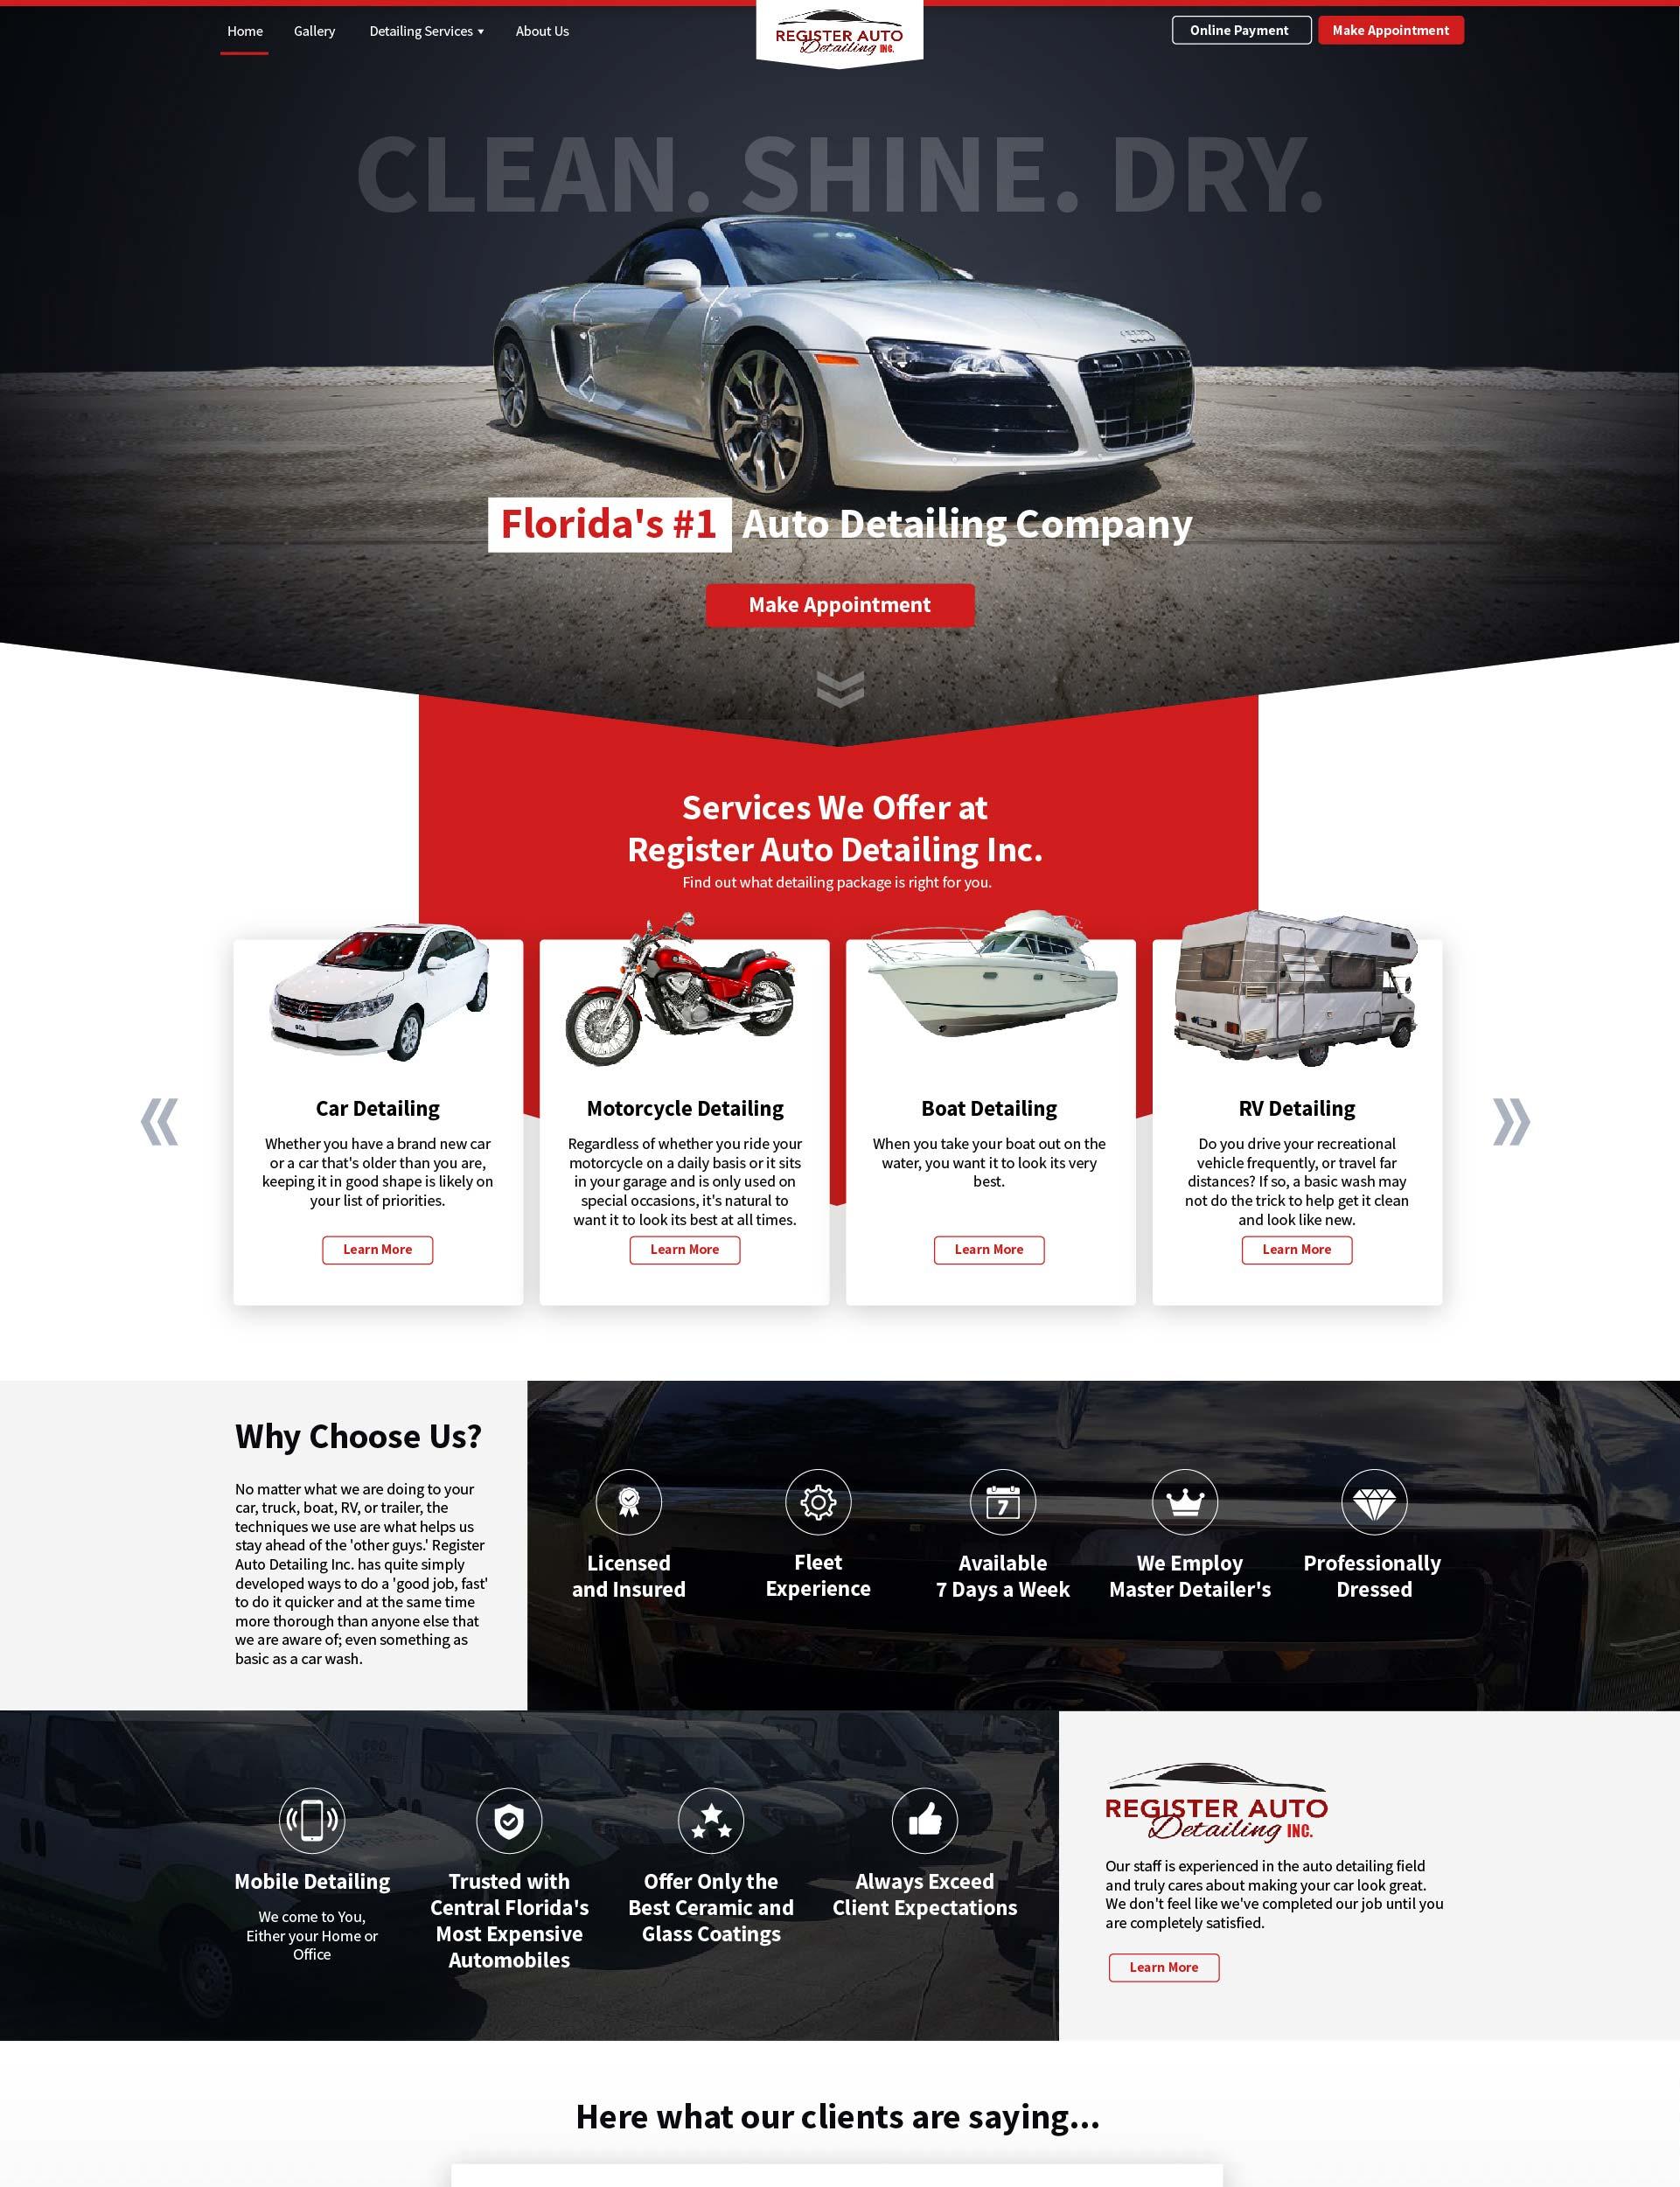 Register Auto Detailing Mockup RankFox Designs redesign